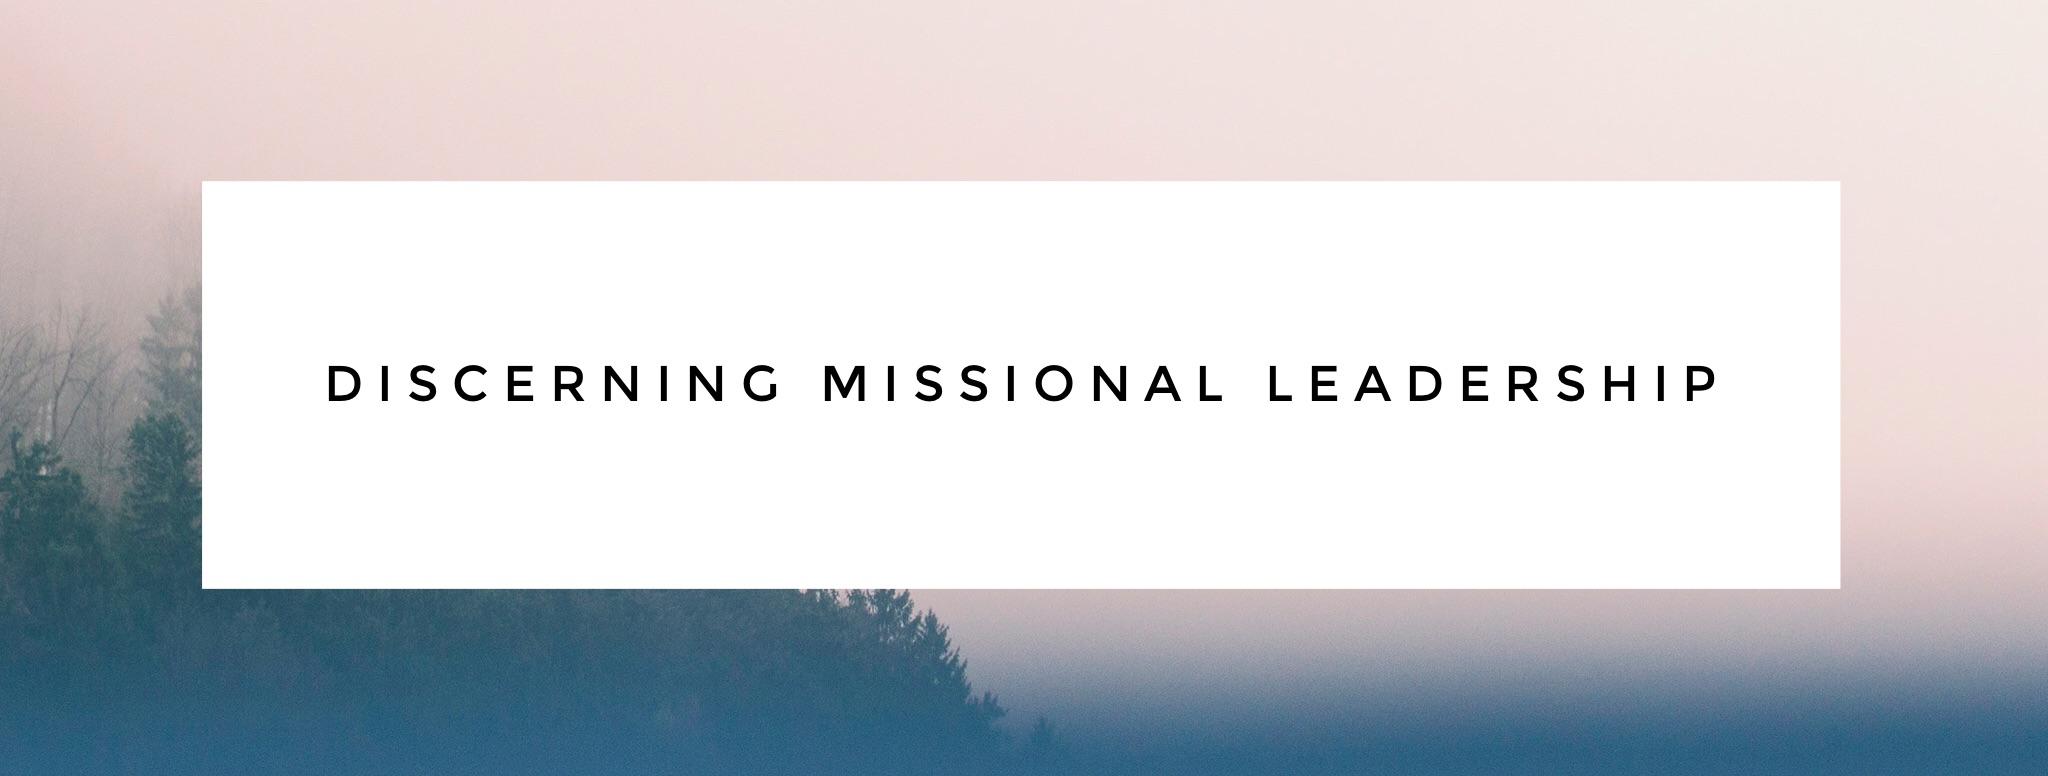 Discerning Missional Leadership.JPG